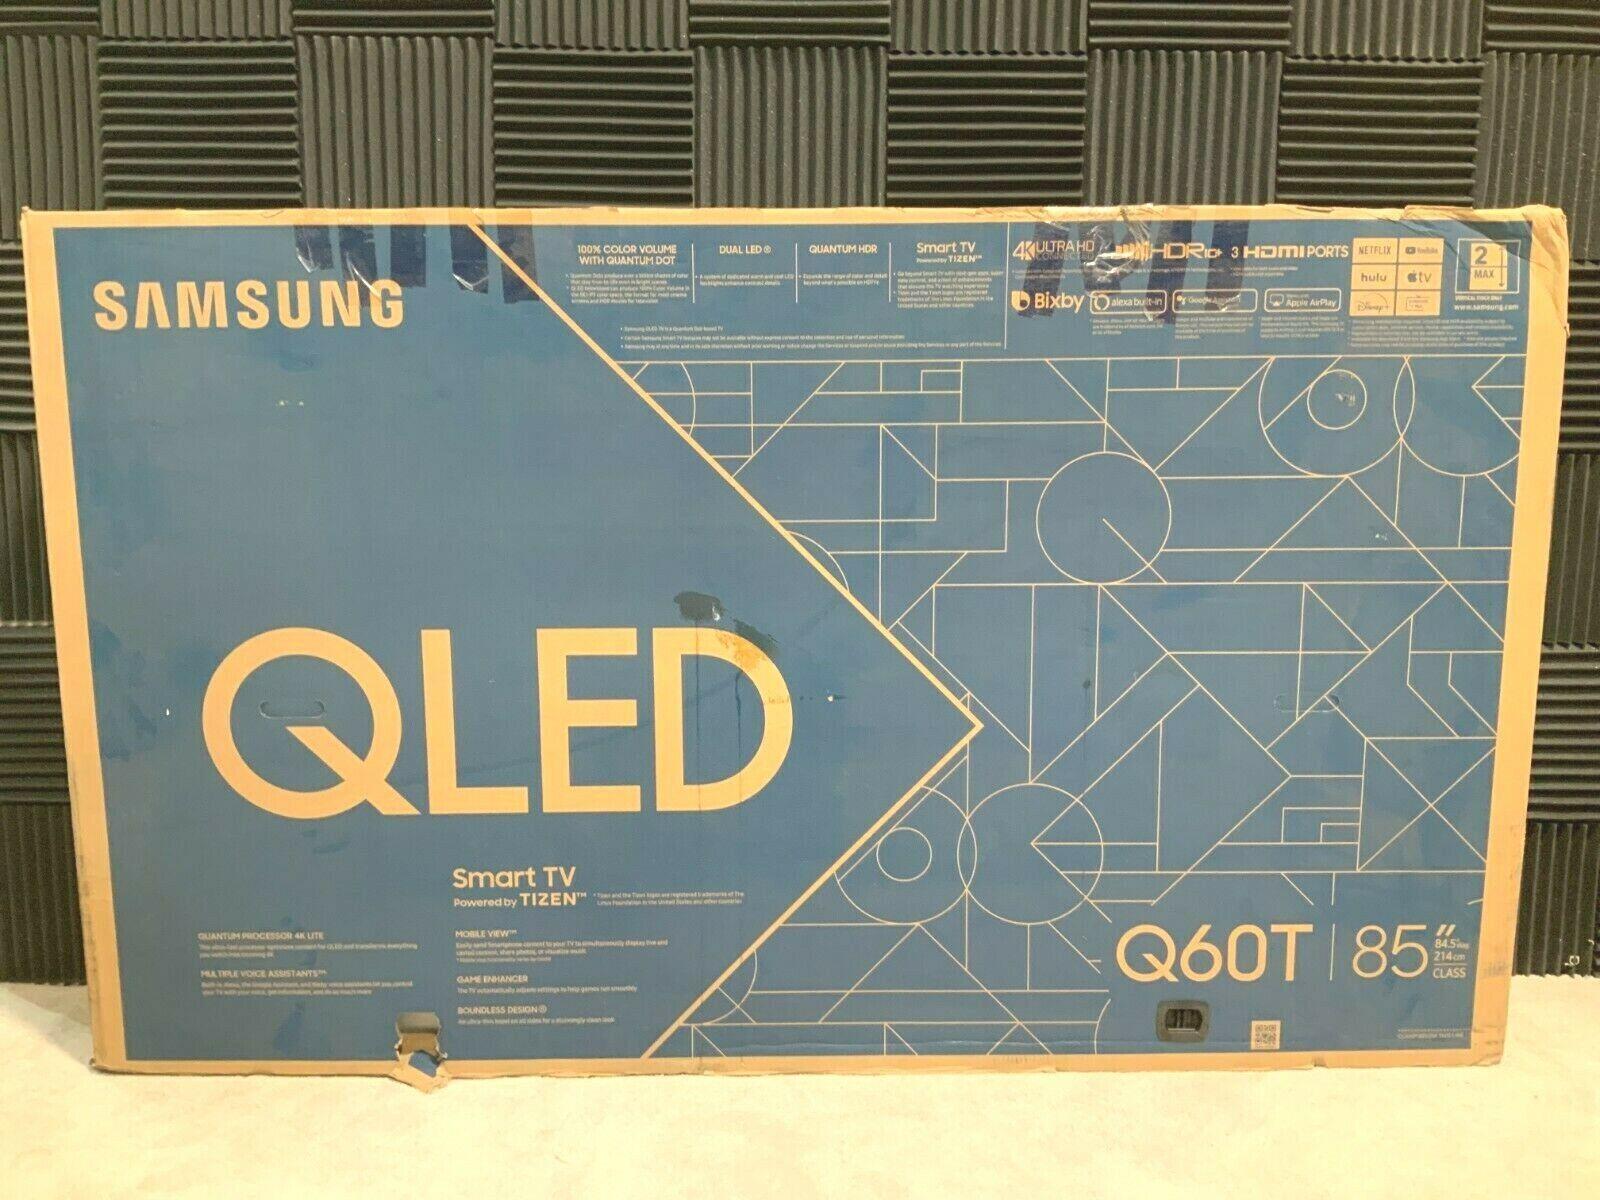 Samsung Q60T 85 QLED Smart TV (4K) QN85Q60TAFXZA Open Box Nice! ❤️️✅❤️️✅READ. Available Now for 1749.99